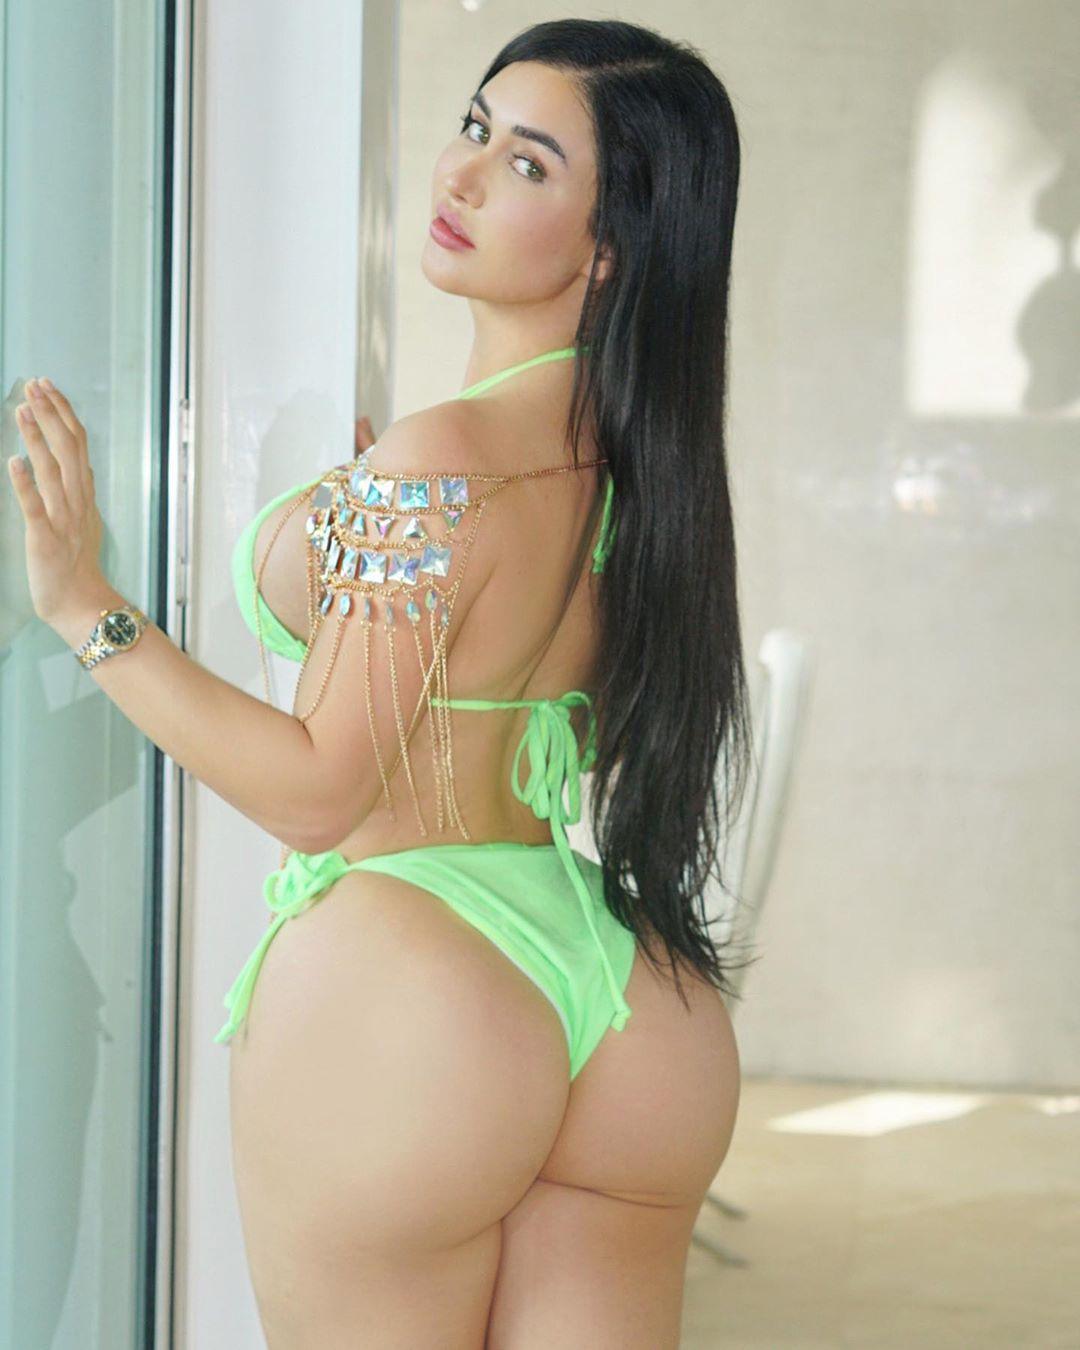 Joselyn Cano Hot Photos in Green Bikini